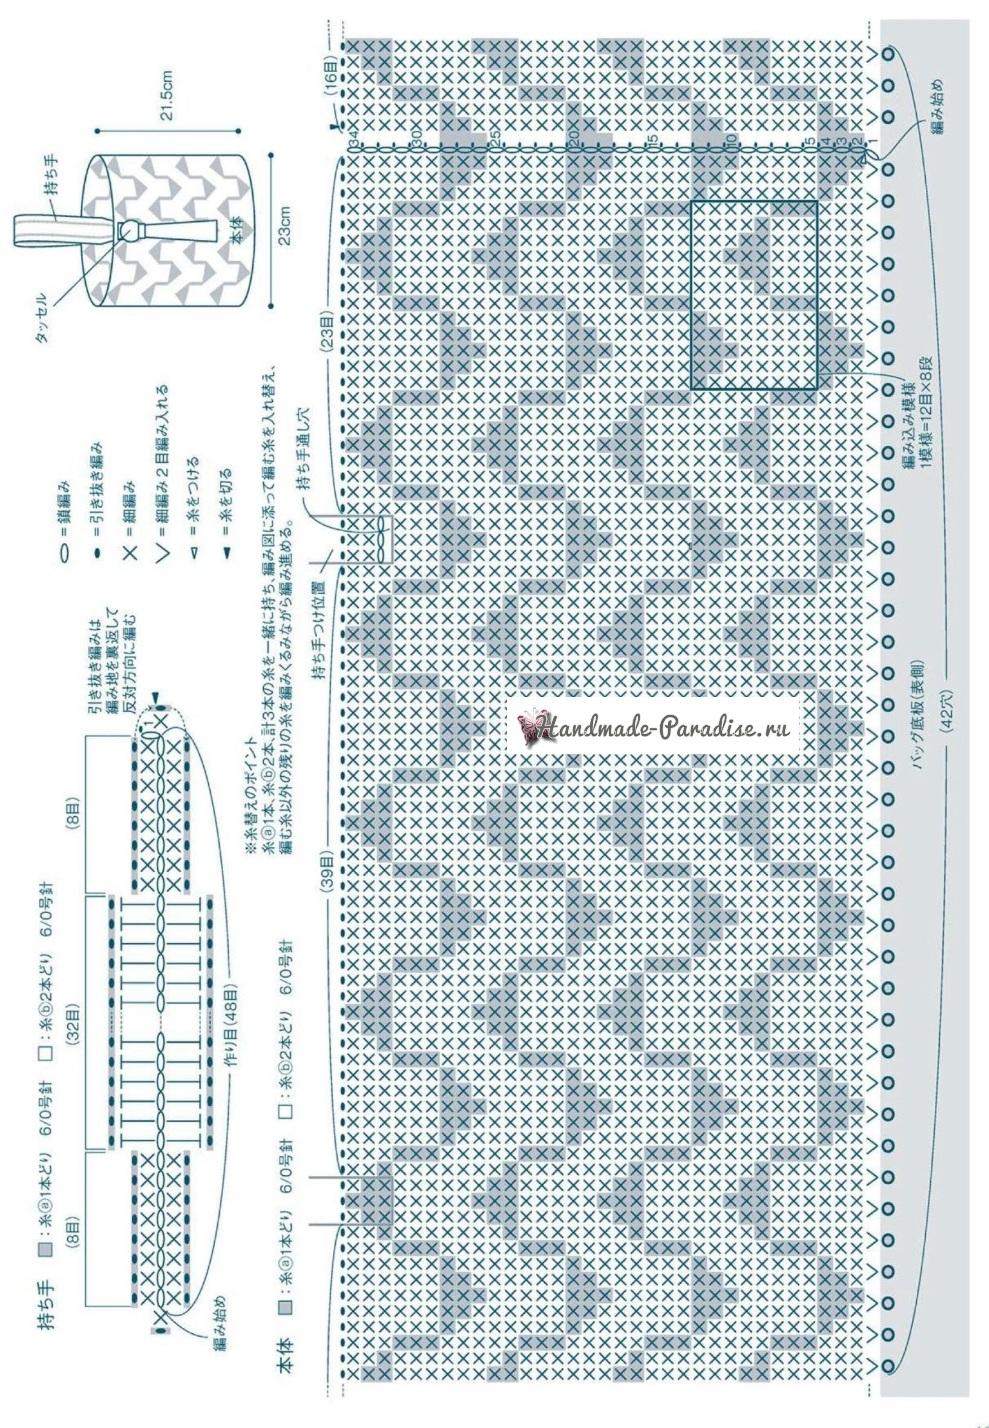 Сумка-мешок крючком жаккардовым узором (2)